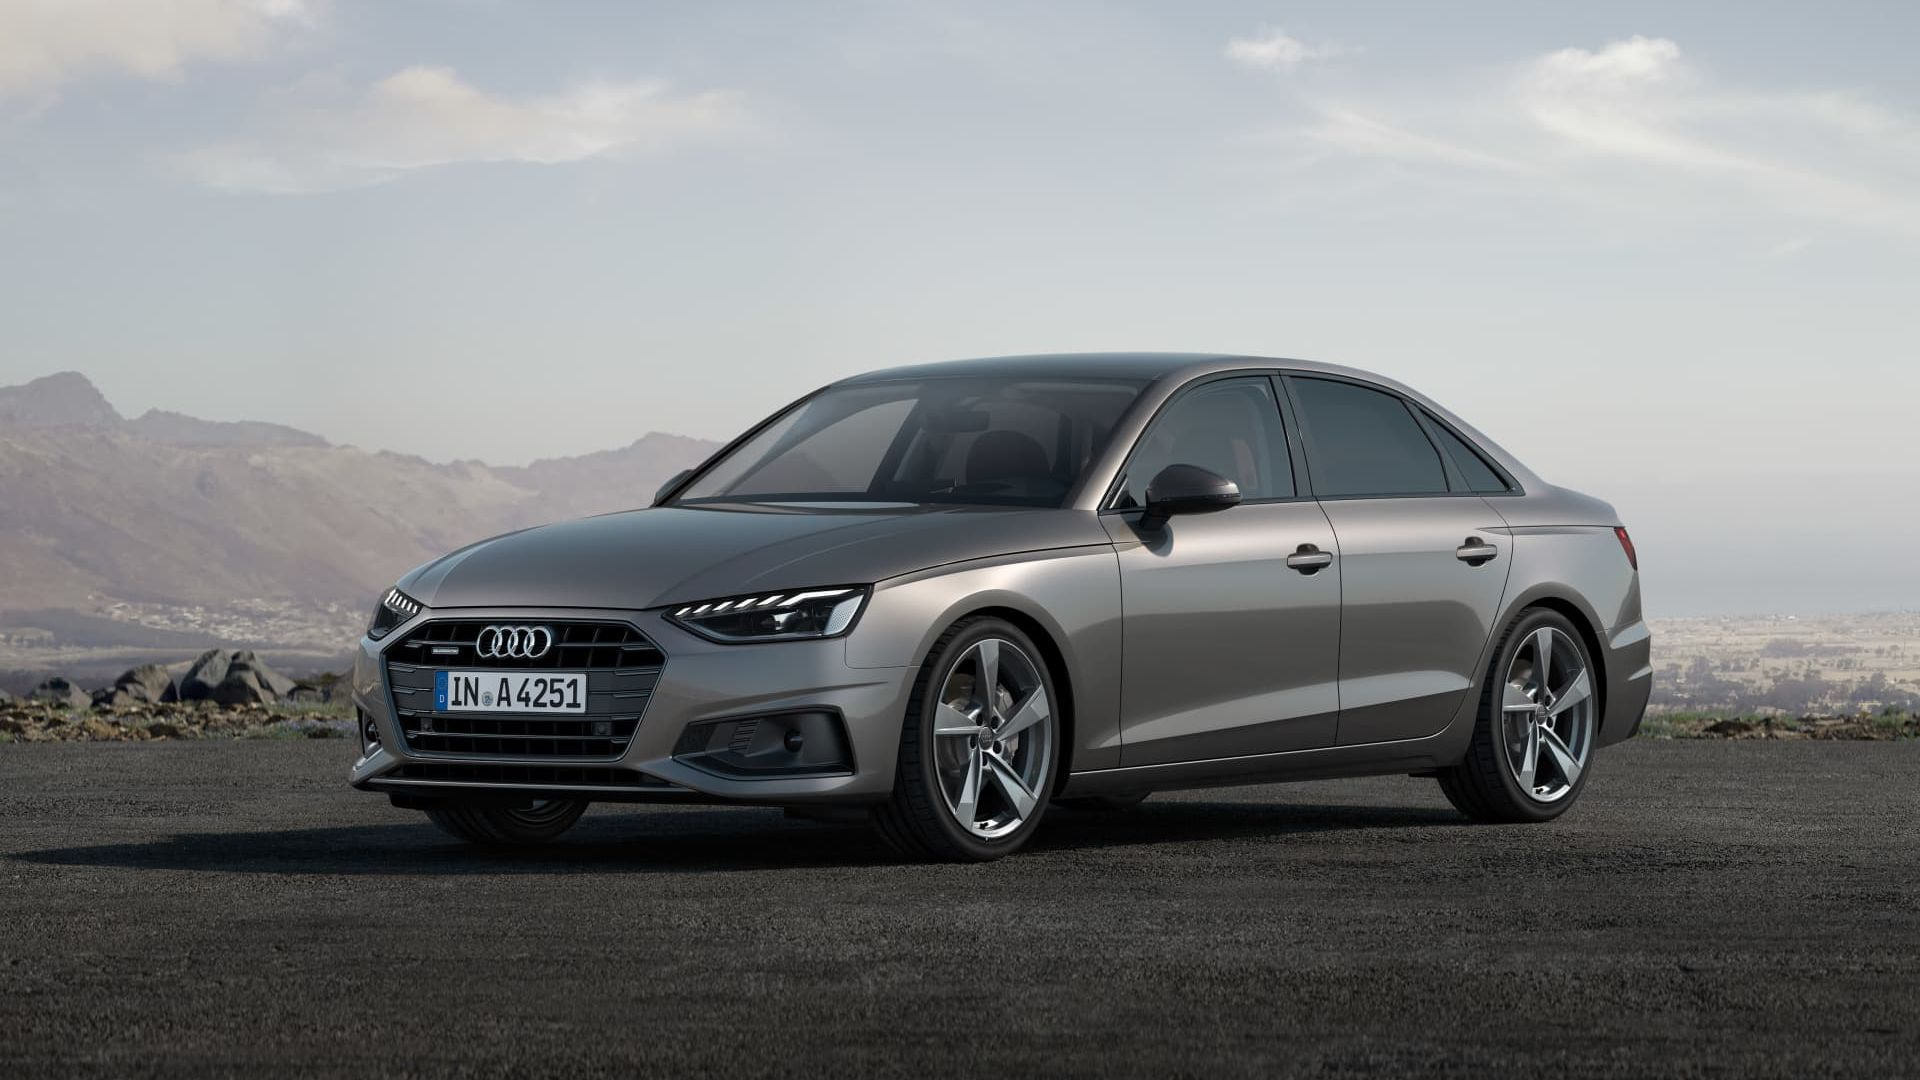 Audi A4 Avant 40 Tdi Black Line Edition Quattro-ultra Avant Aut. 7v